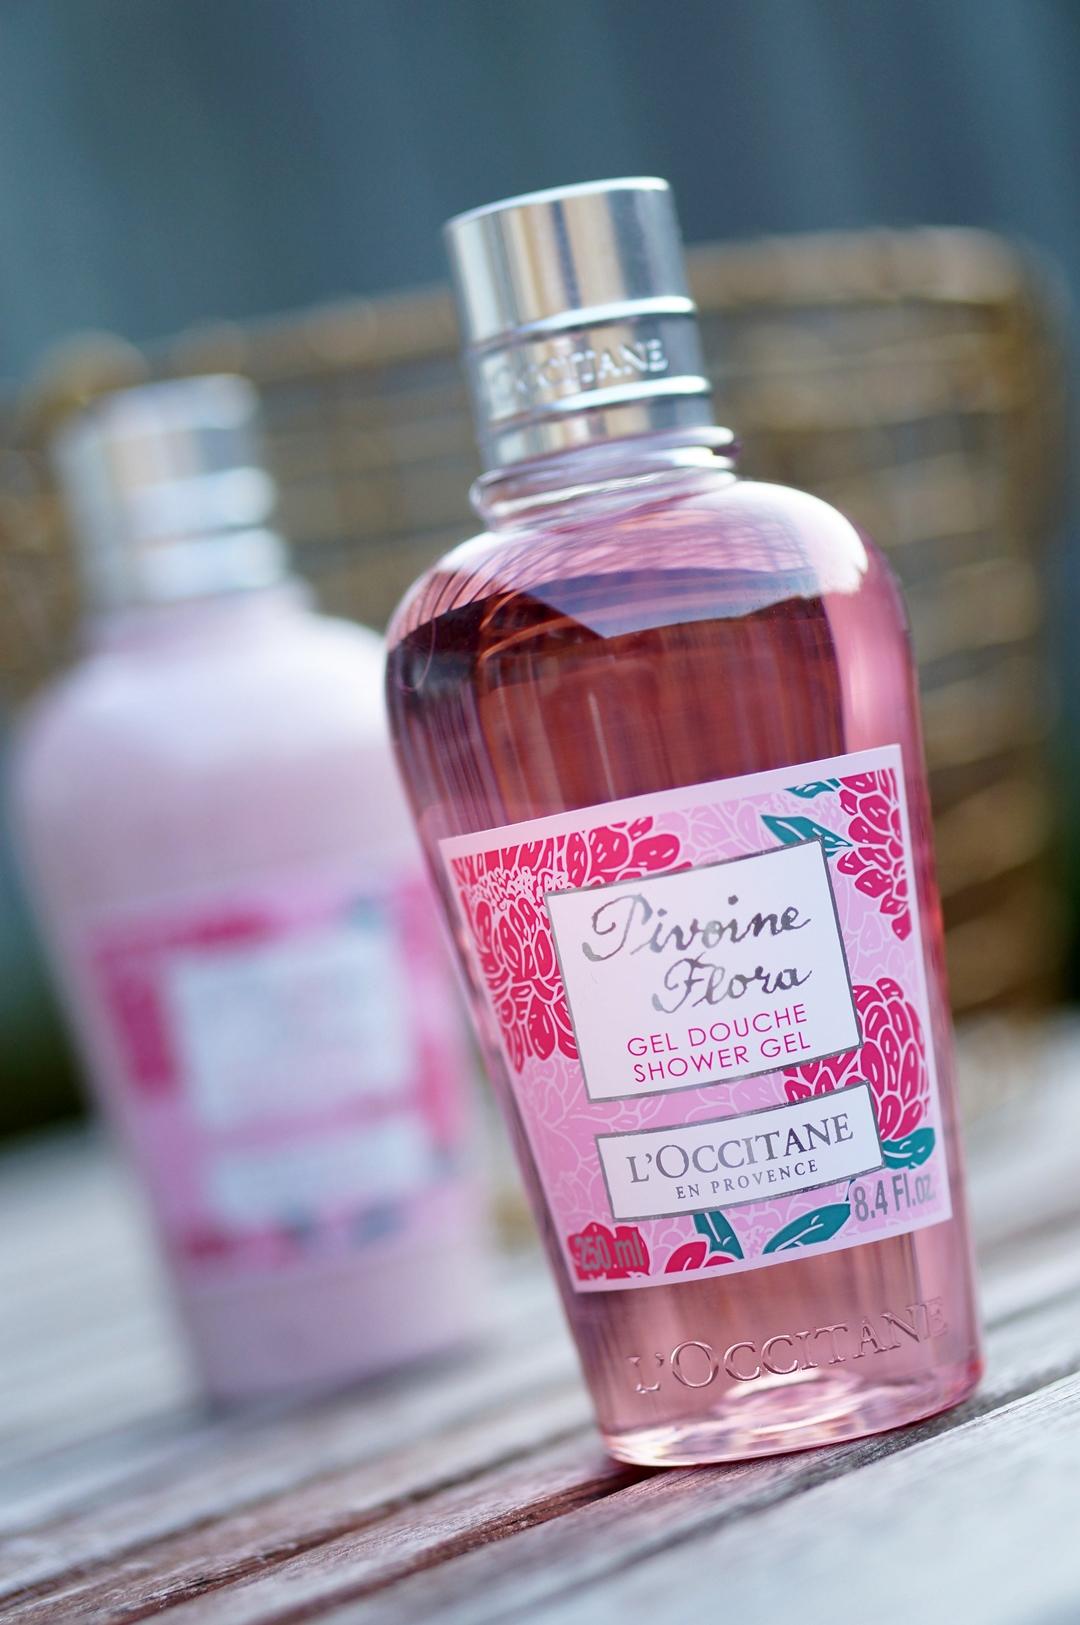 L'occitane-pivoine-floraeau-de-toilette-shower-gel-body-lotion-lippenbalsem (6)